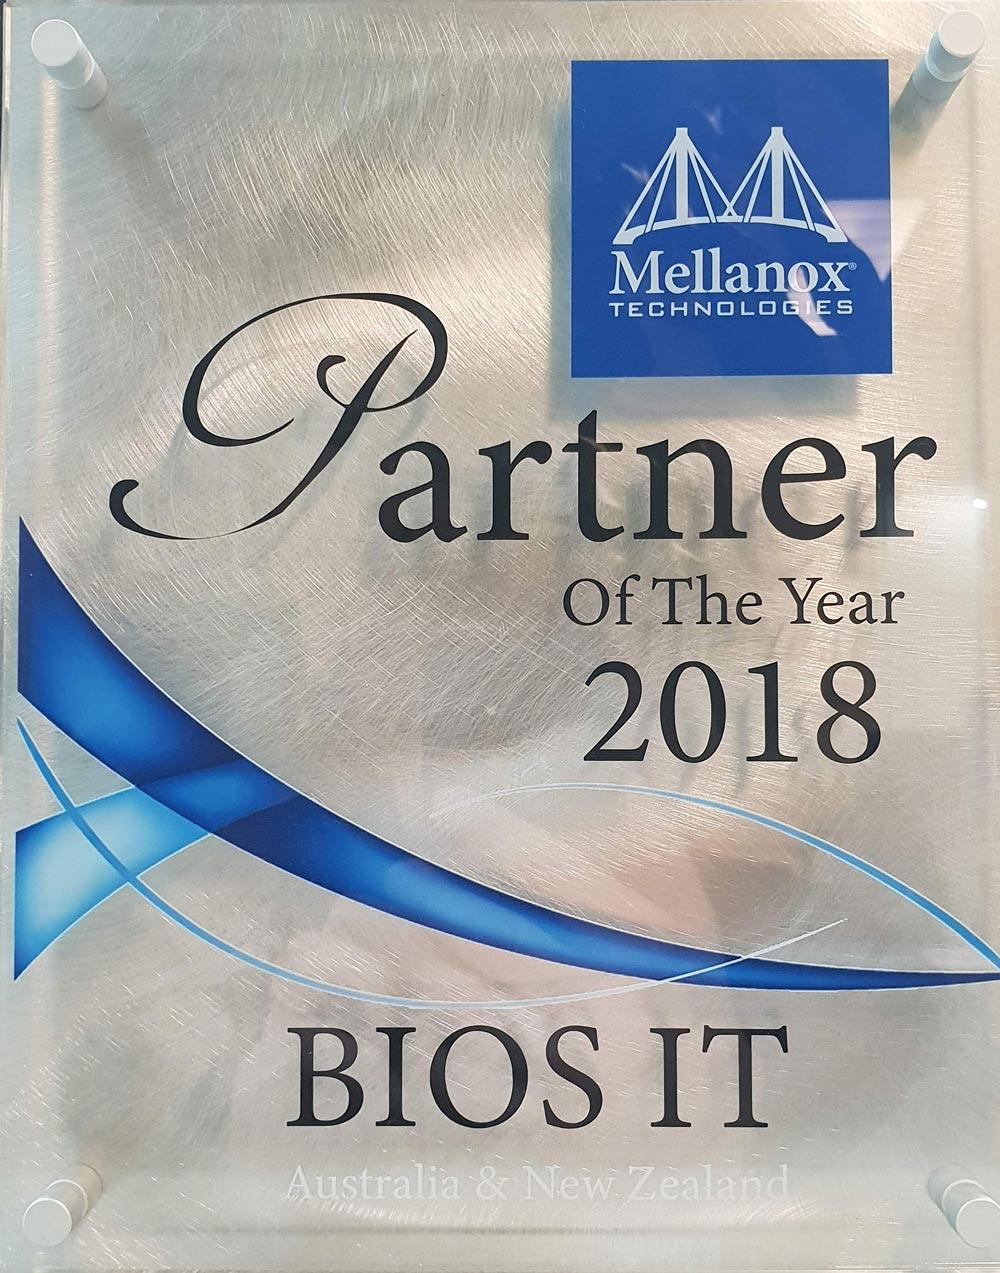 mellanox partner of the year award